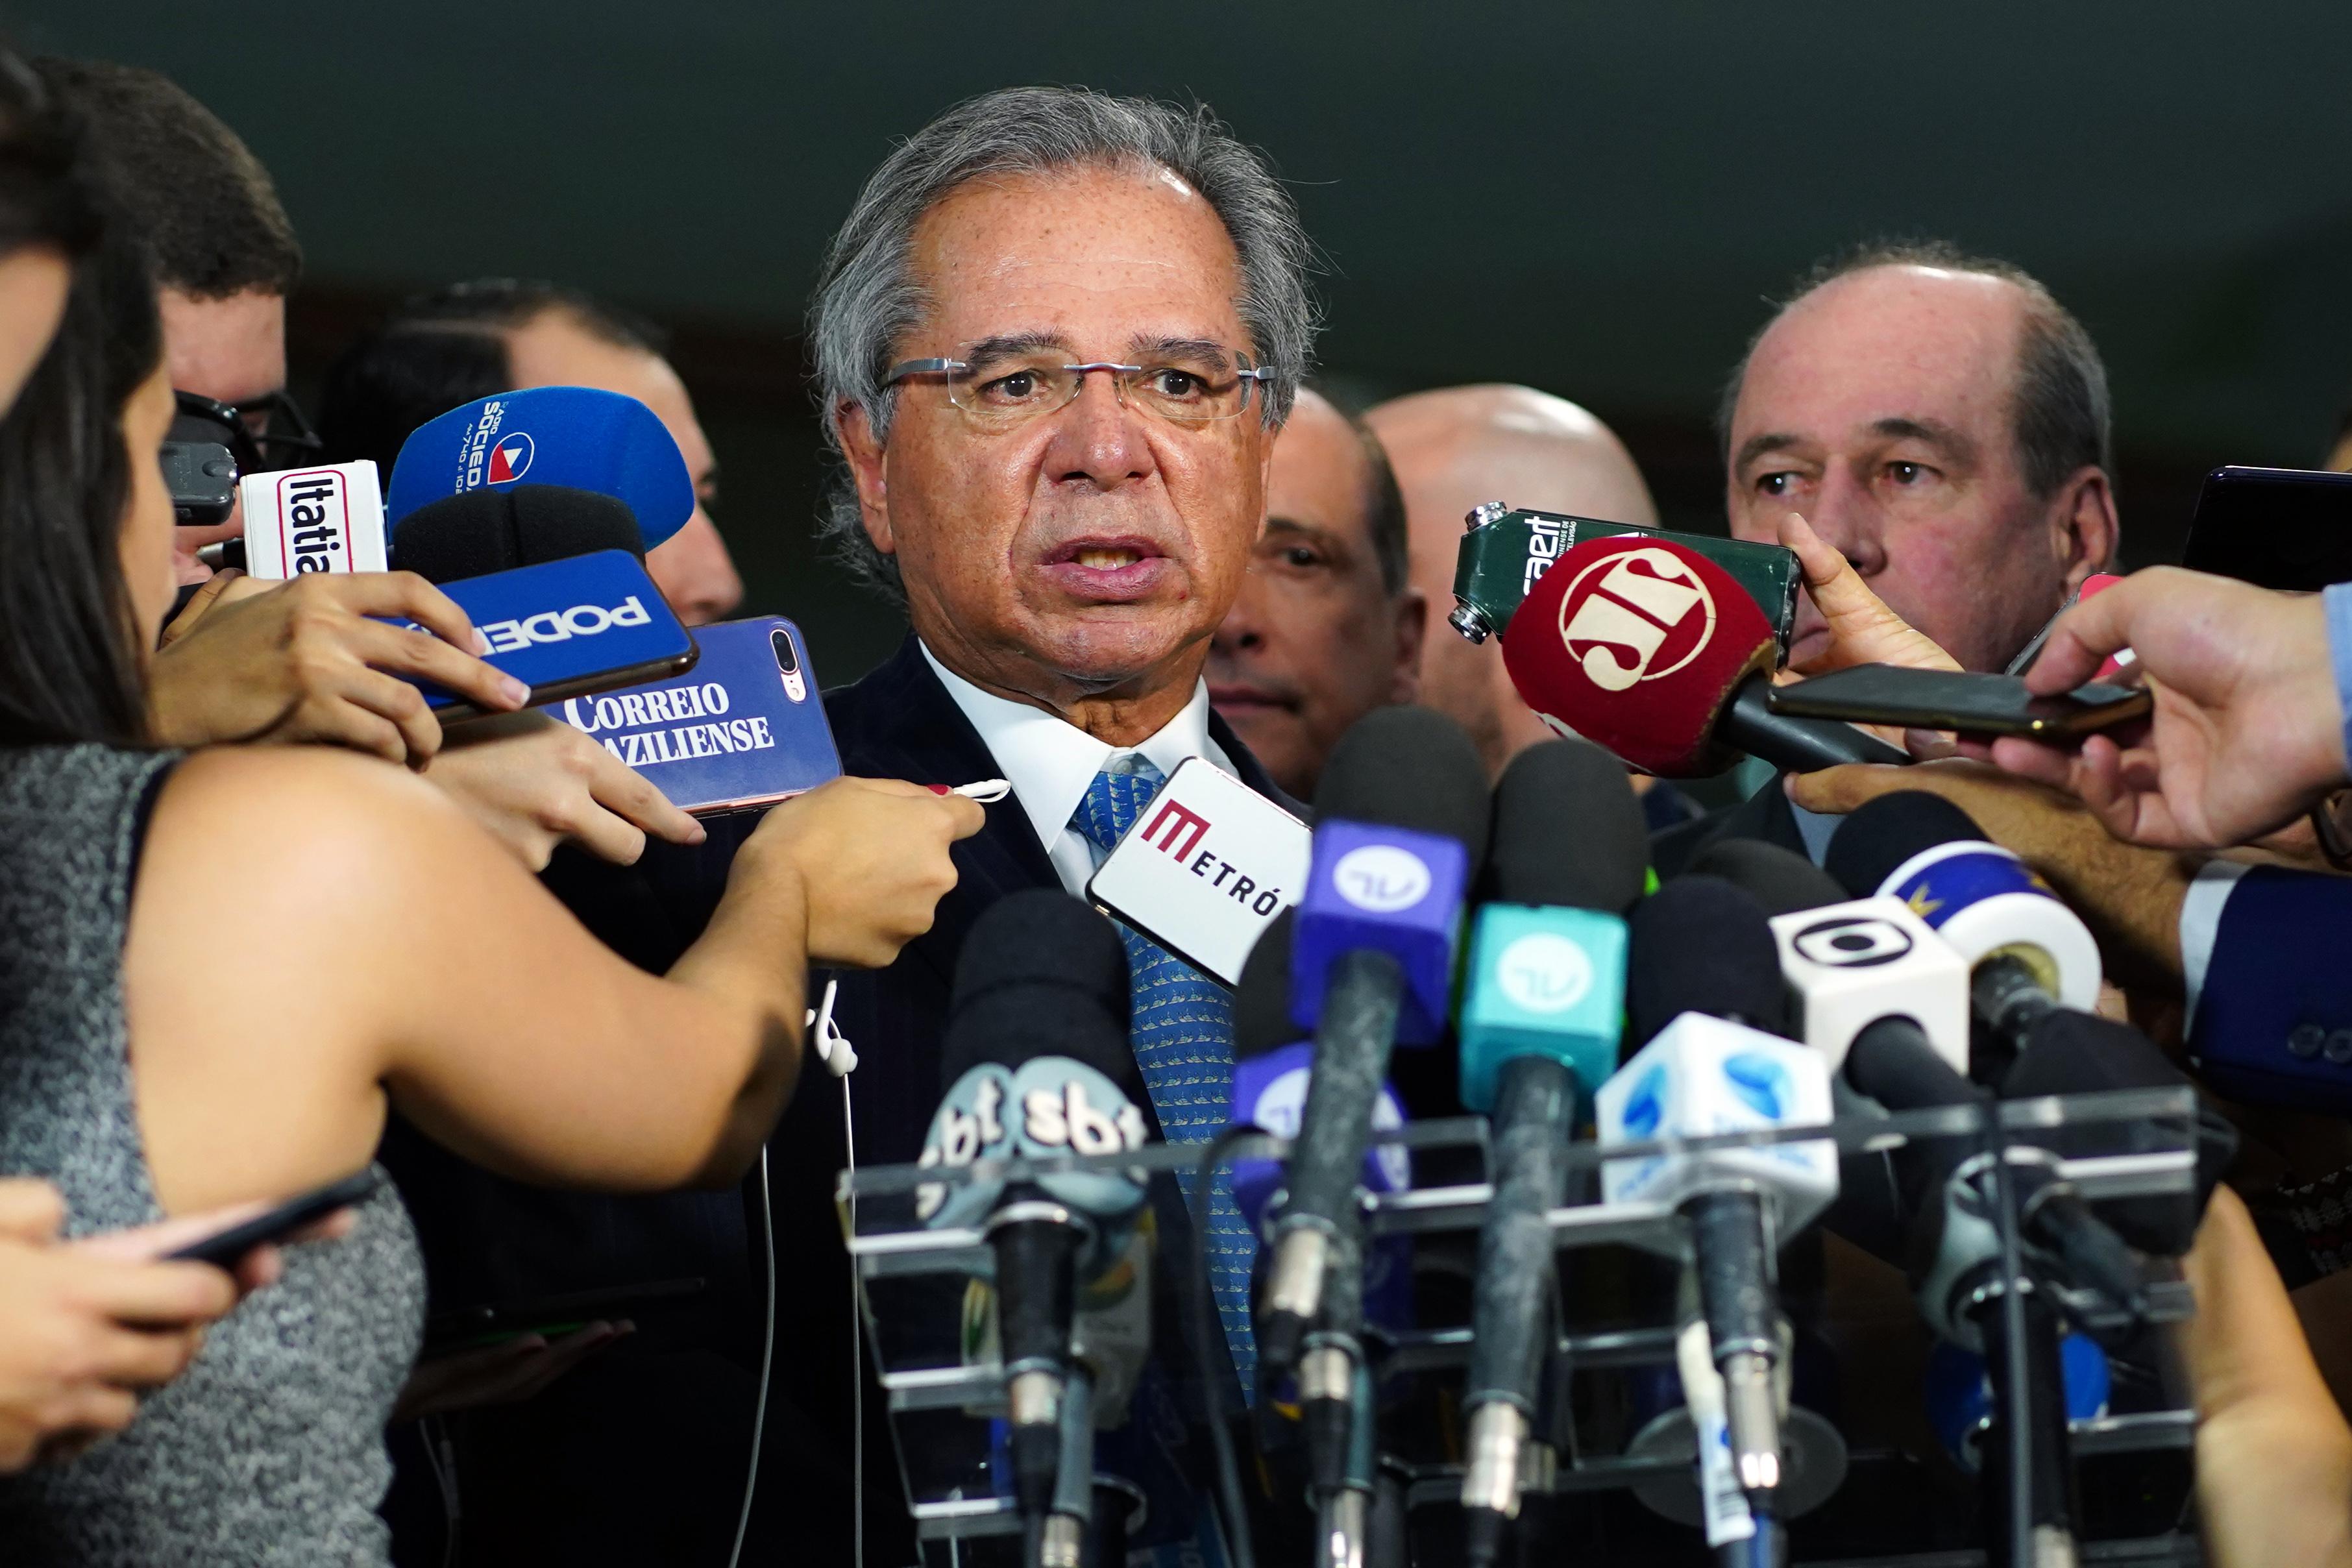 Entrega da proposta de reforma da previdência dos militares. Ministro da Economia do Brasil, Paulo Guedes